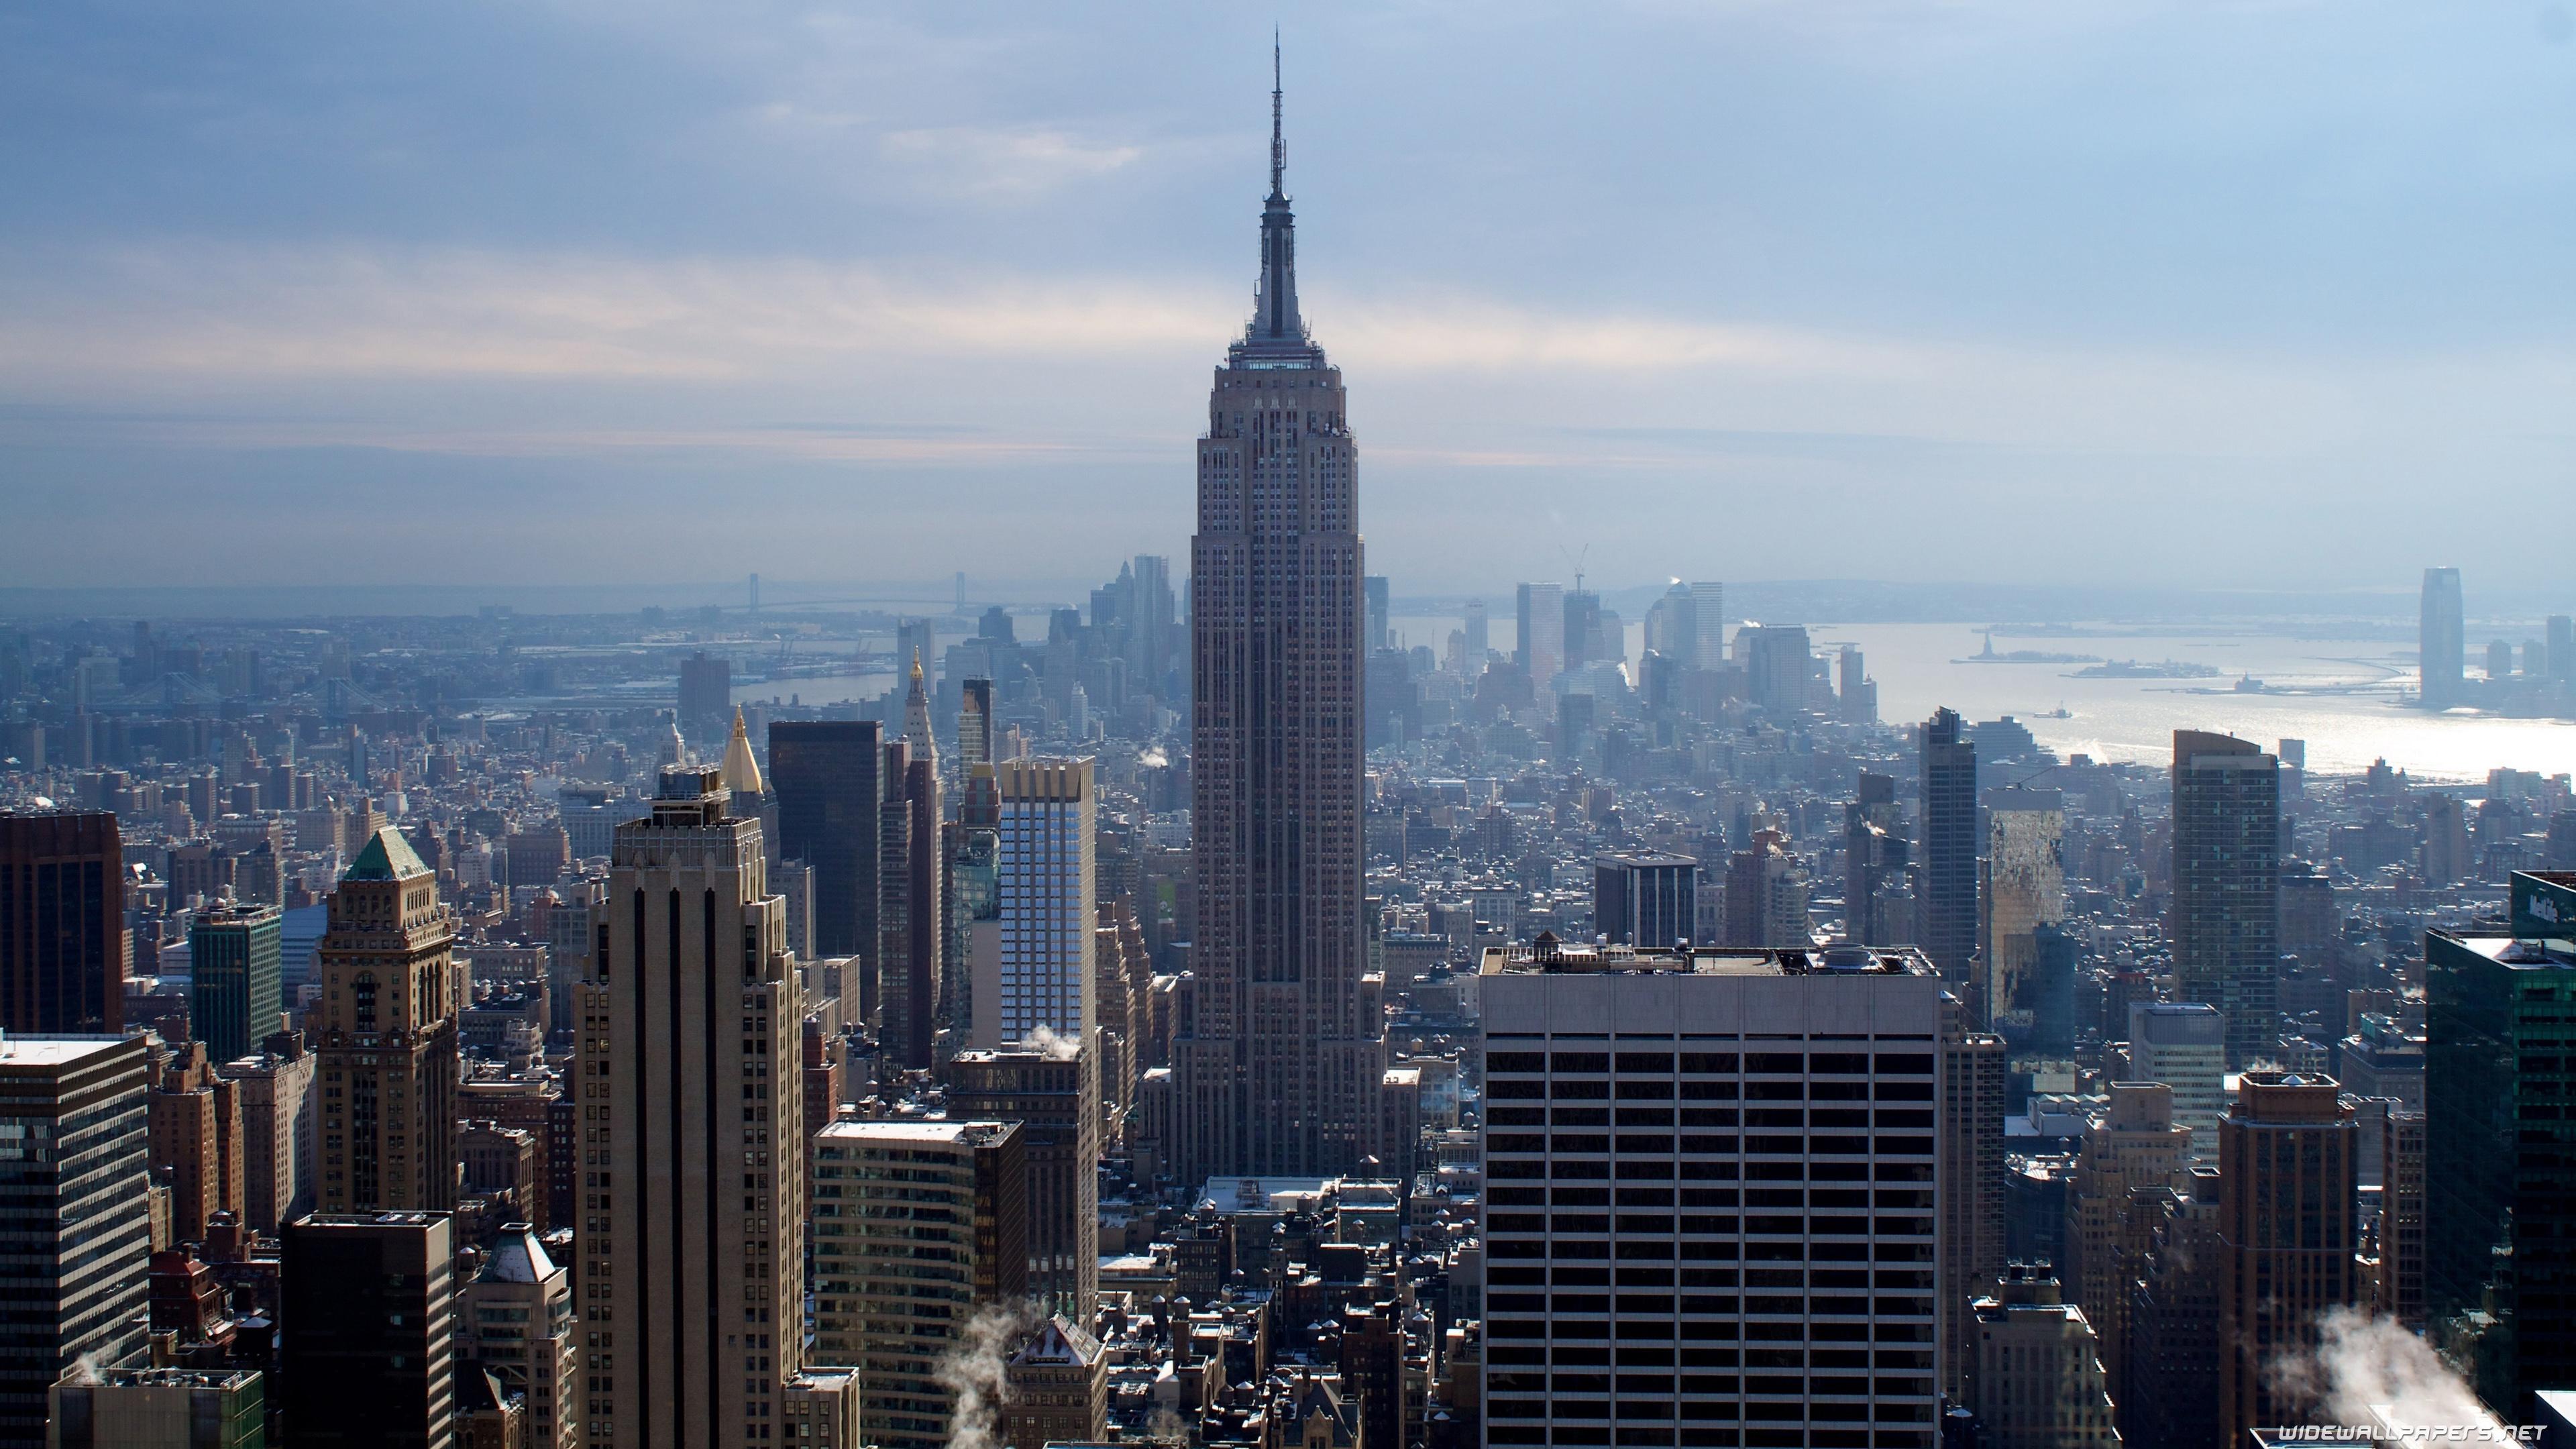 New York desktop wallpapers 4K Ultra HD 3840x2160